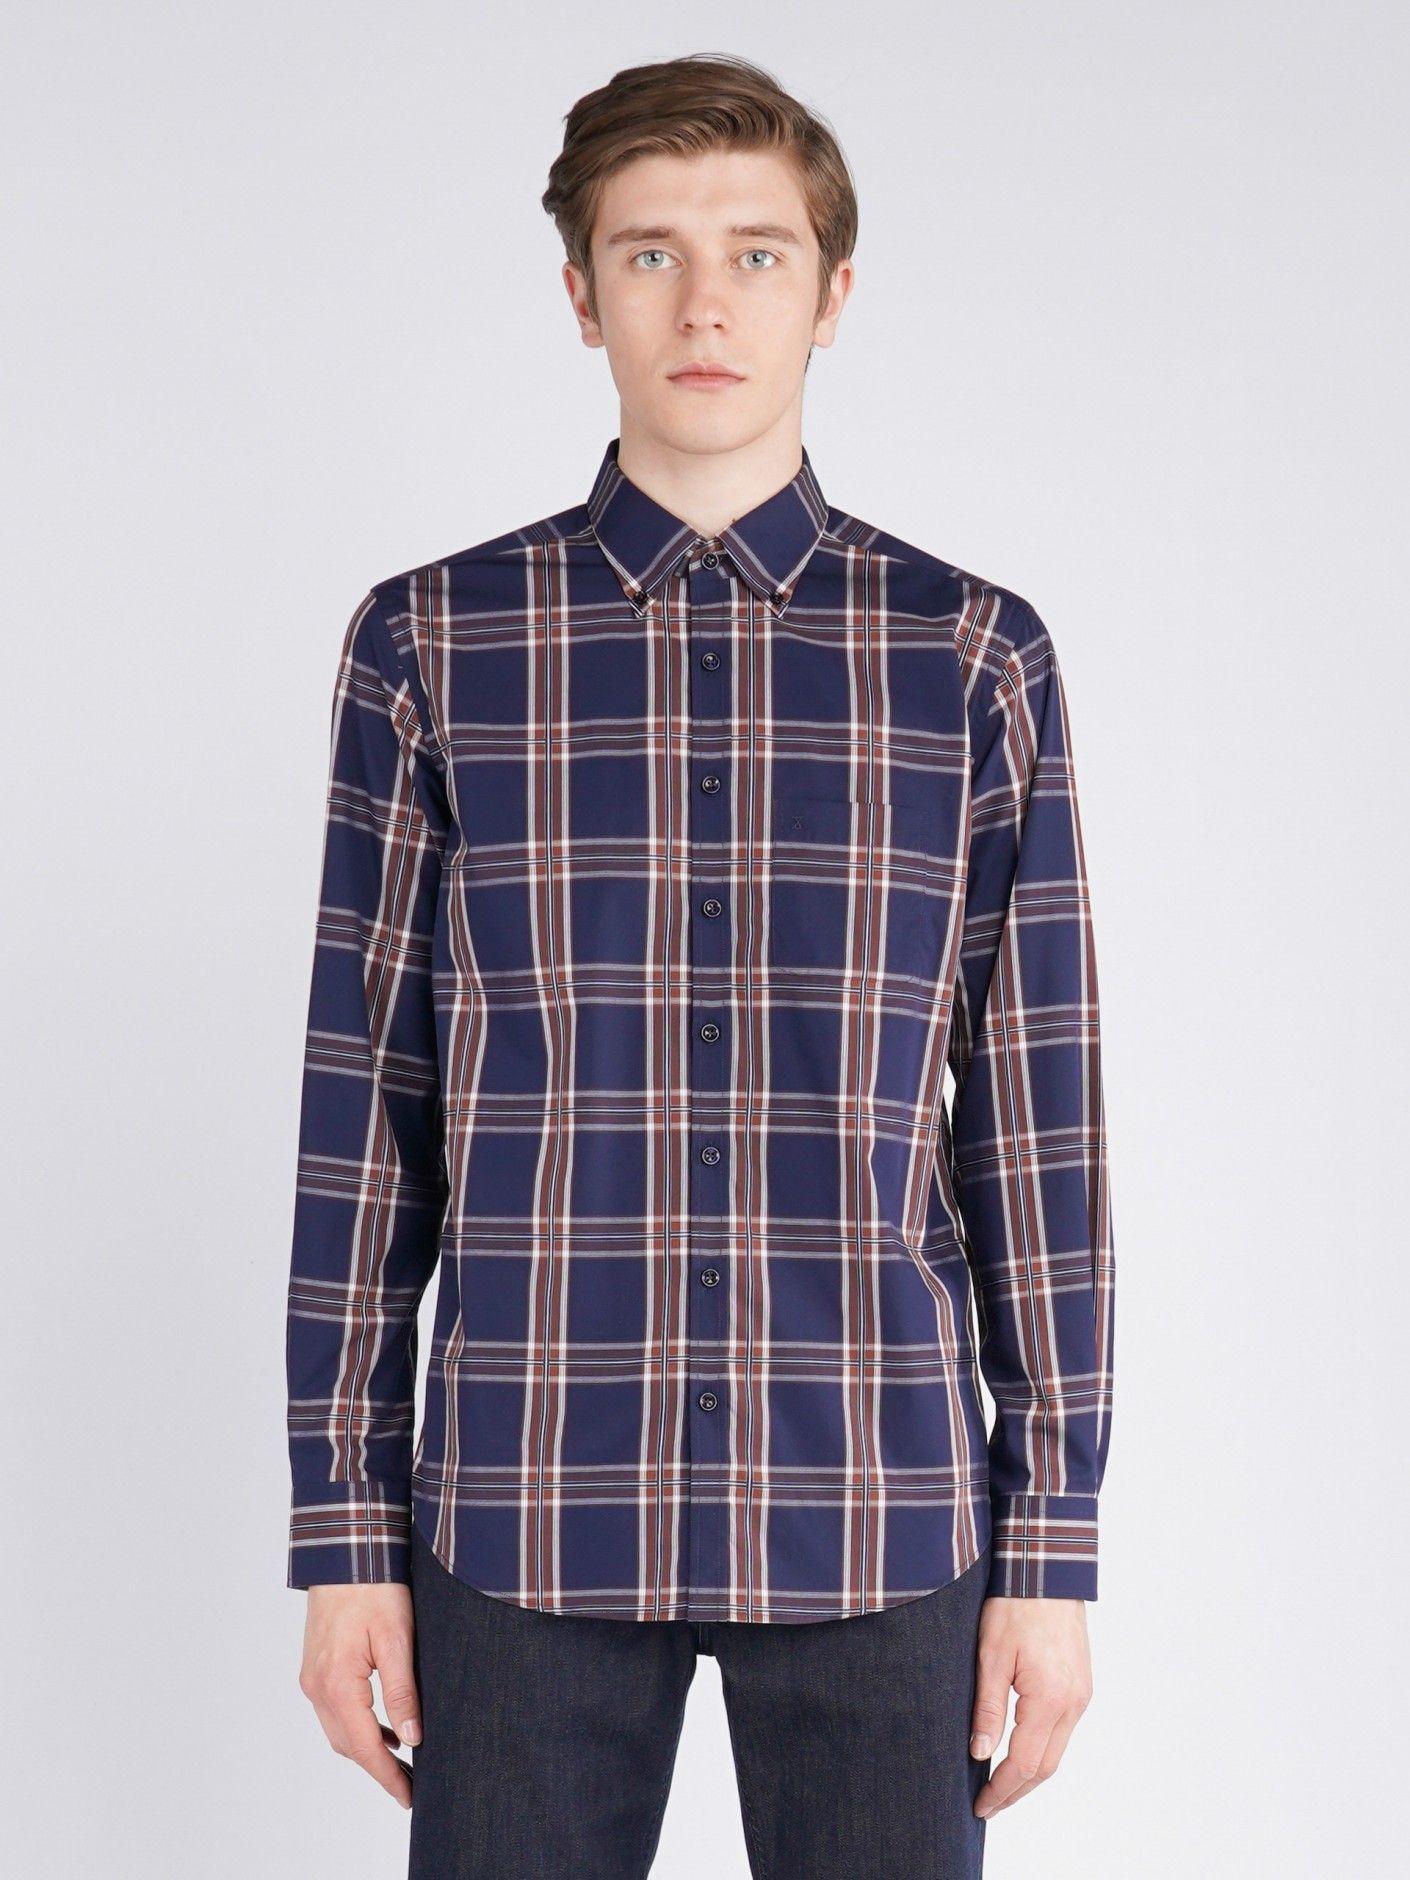 Camisa em tecido xadrez Decenio